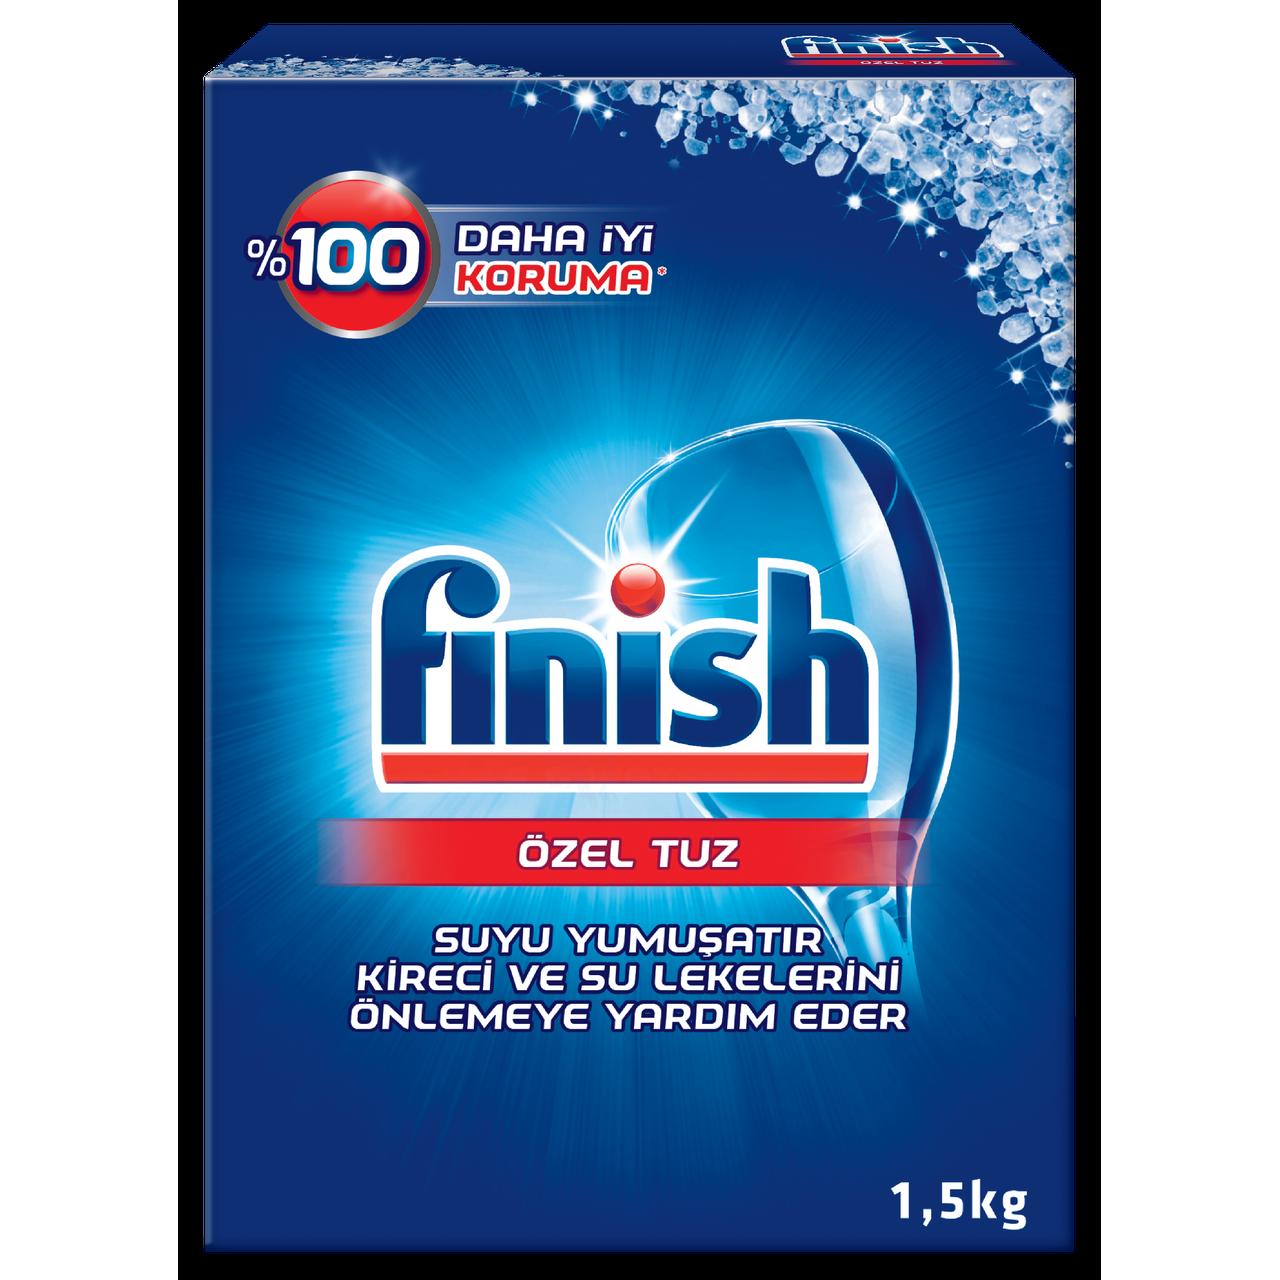 Finish Tuz 1,5 Kg